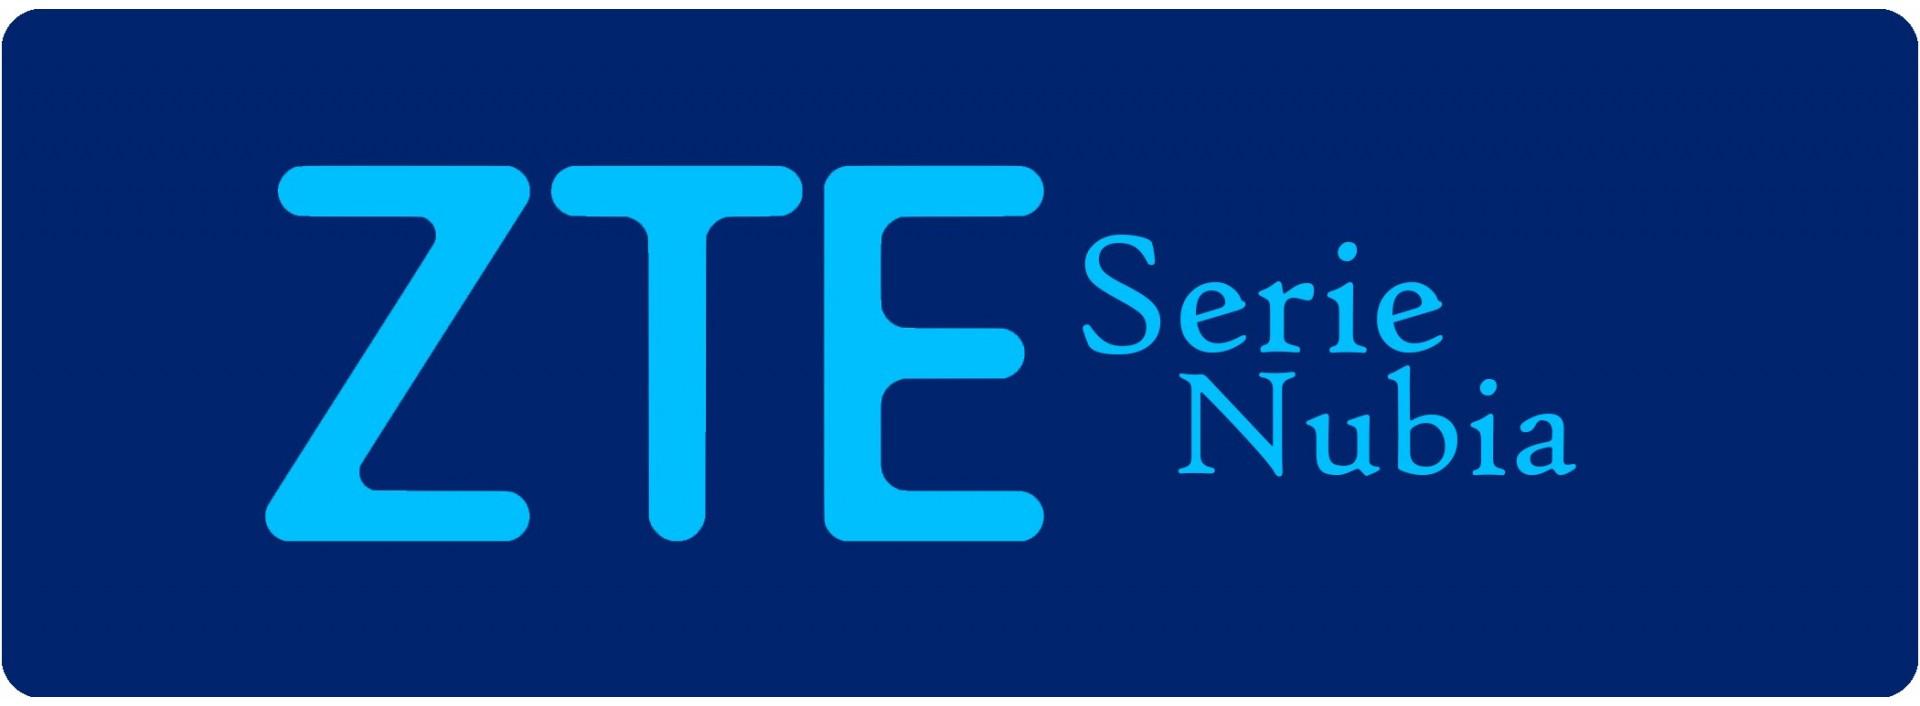 Fundas para ZTE Serie Nubia